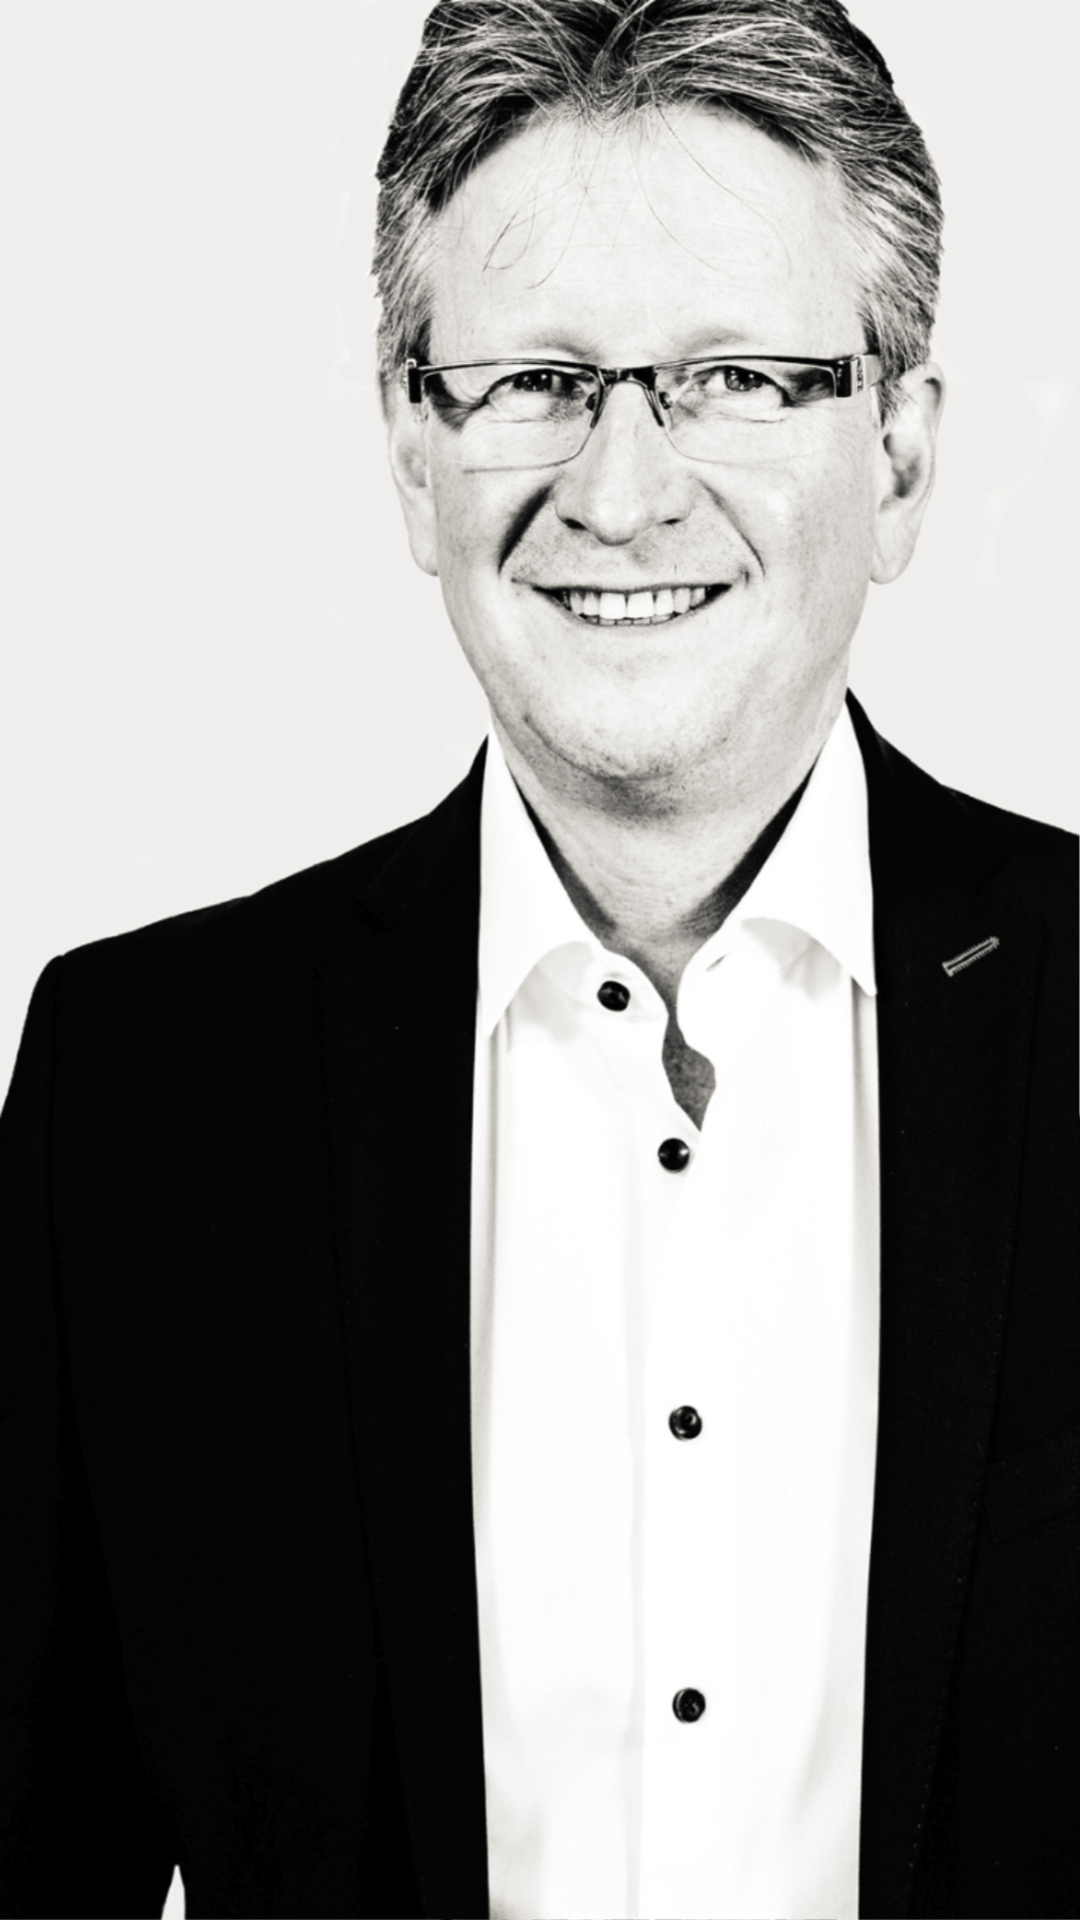 Martin Kretzer